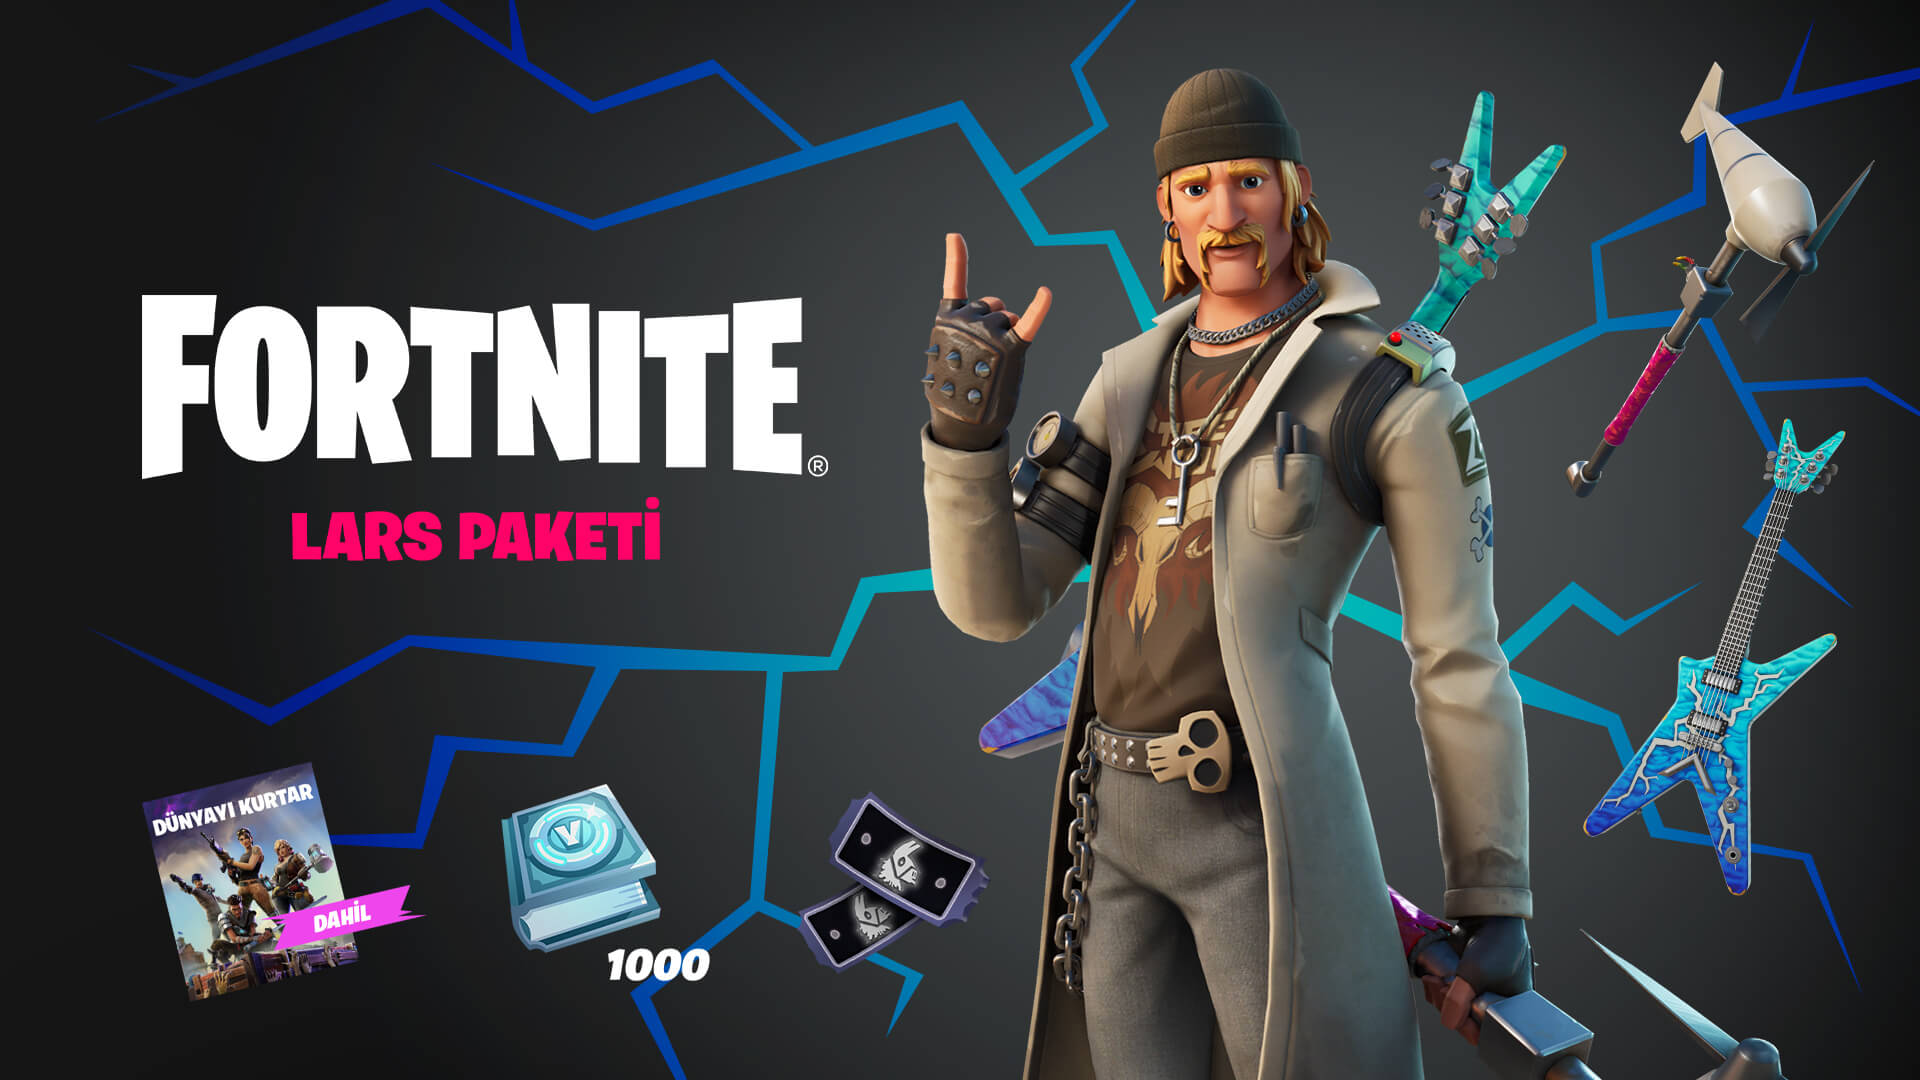 tr-fortnite-save-the-world-lars-pack